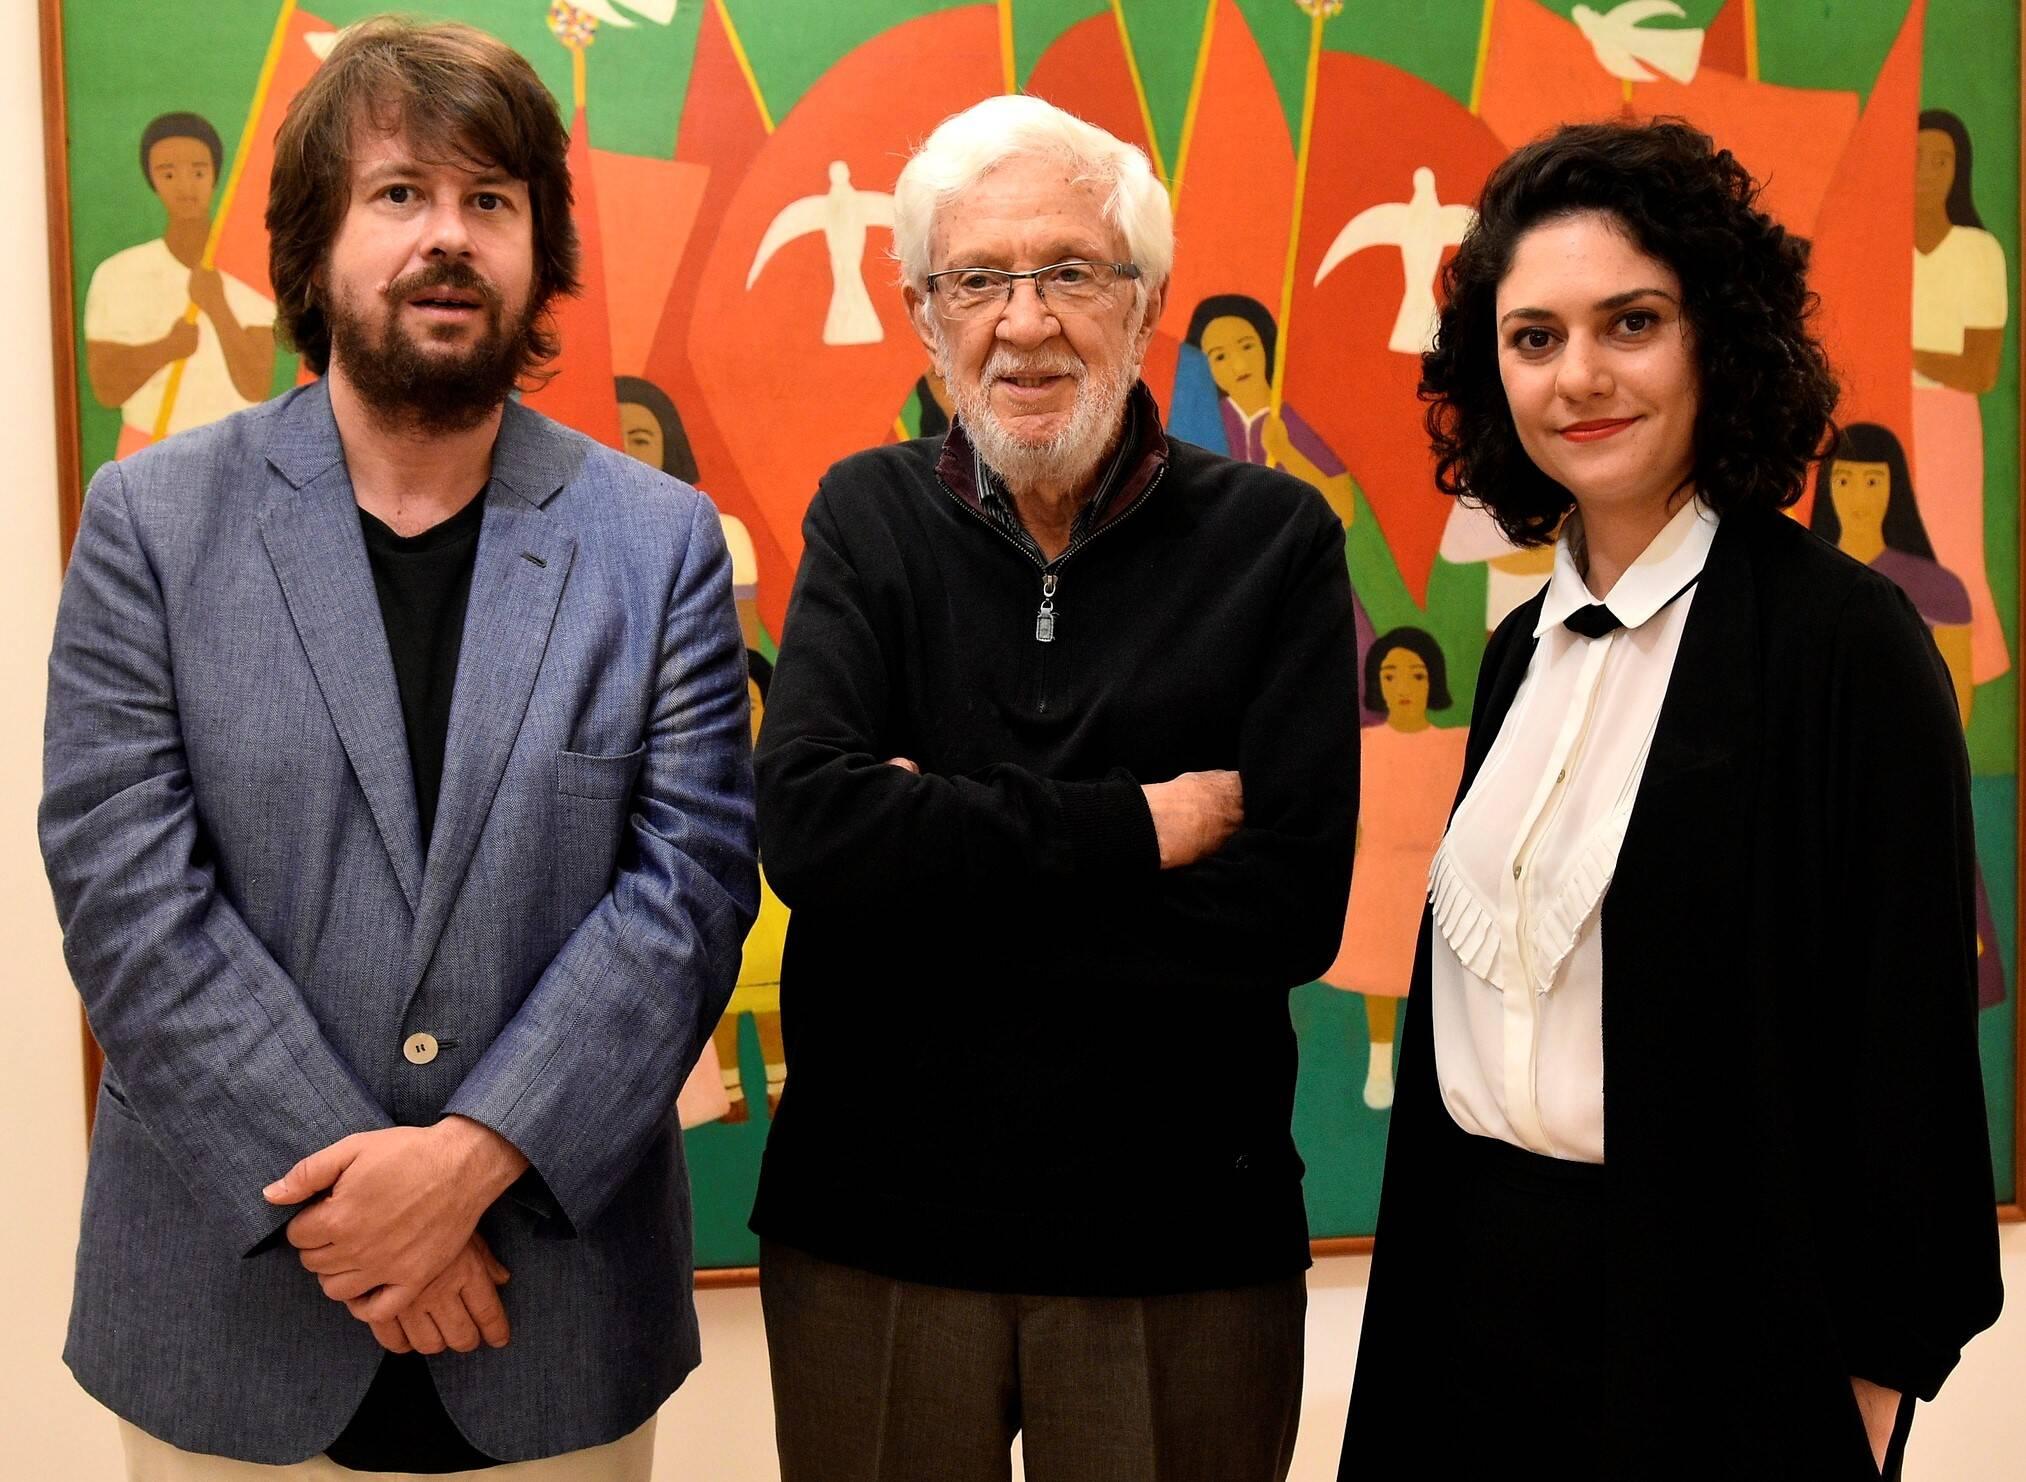 Rodrigo Moura, Frederico Moraes e Isabella Rjeille  /Foto: Roberto Teixeira